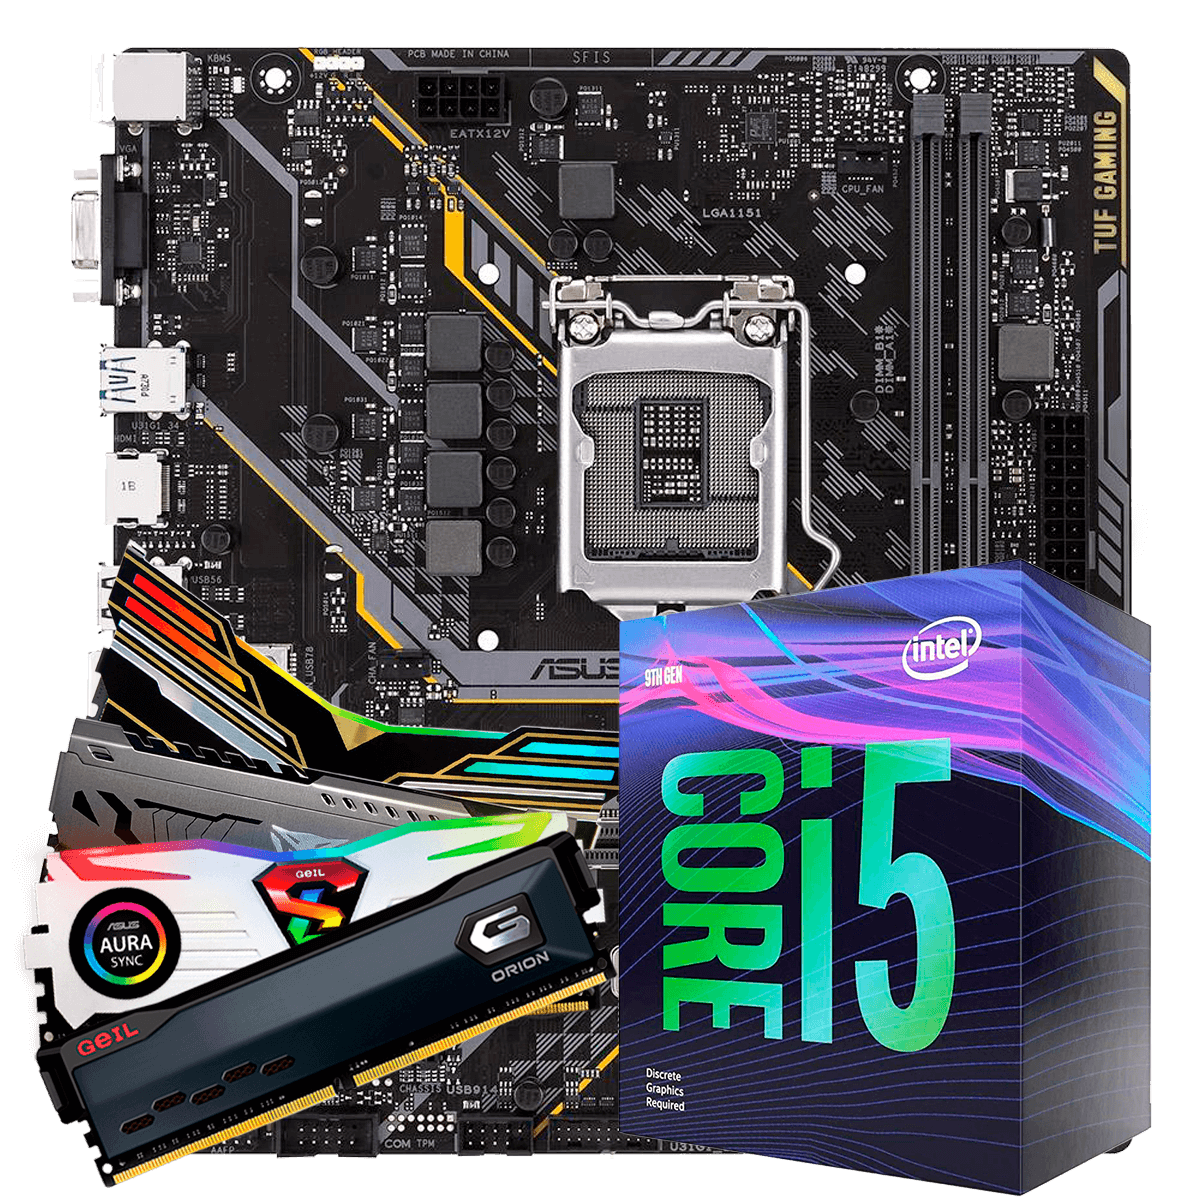 Kit Upgrade, i5 9400F, Asus TUF H310M-Plus Gaming, Memória DDR4 8GB 3000MHz